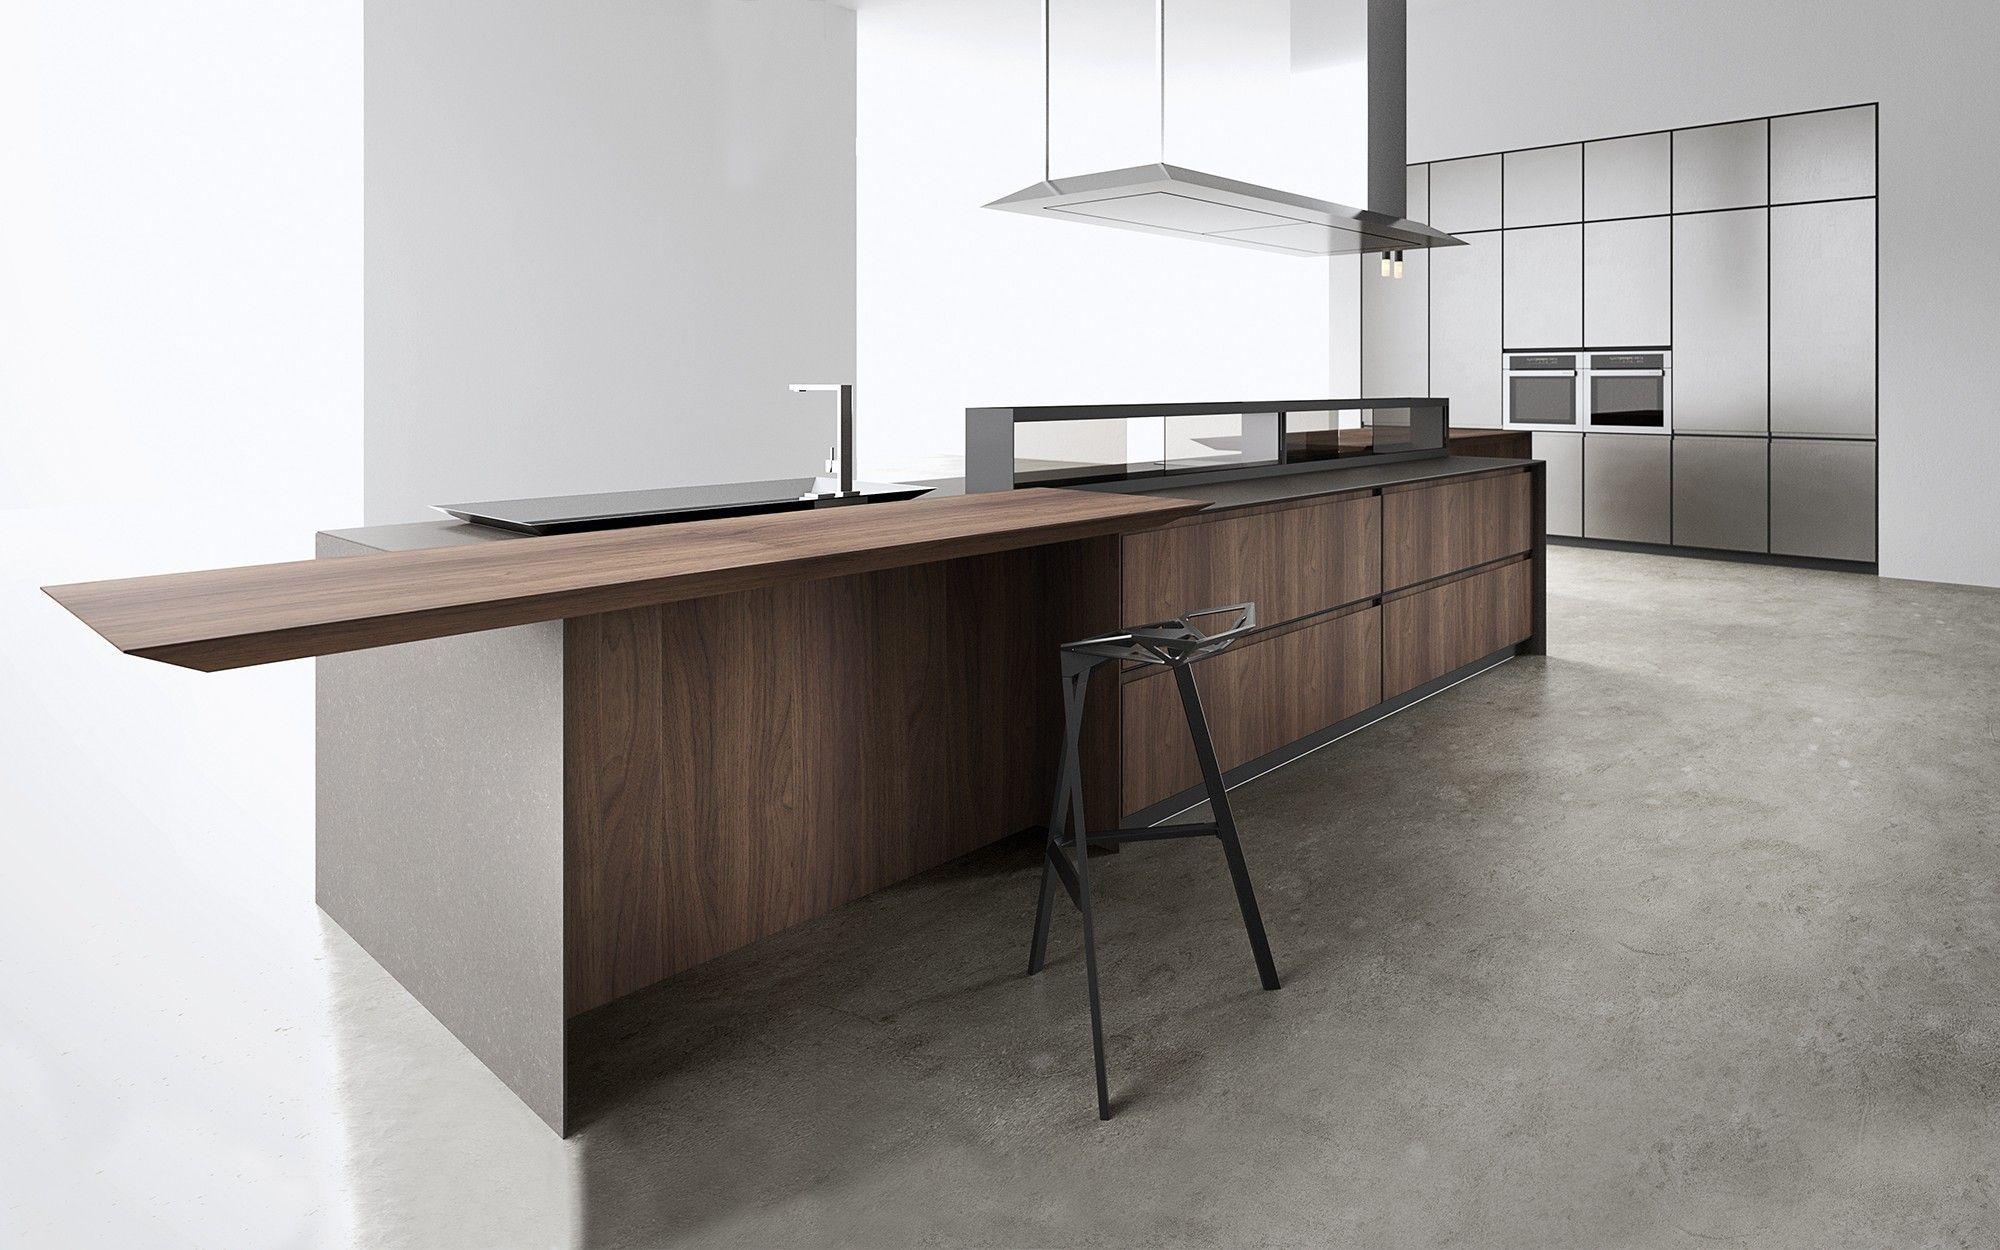 Arrital \u0027AK06\u0027 Kitchen Collection   Designed by Franco Driusso ...